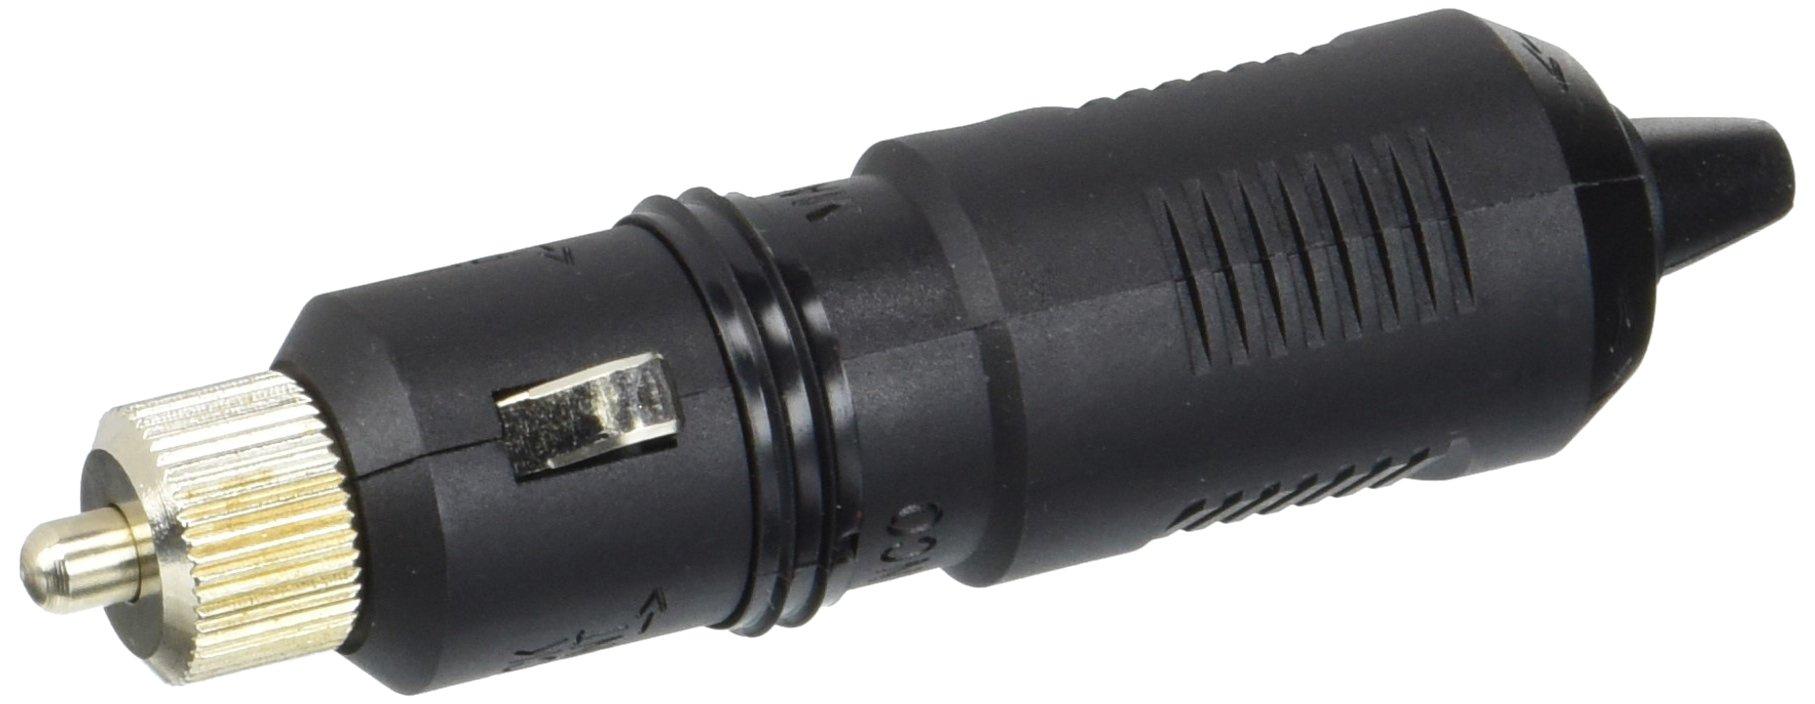 Marinco 12VPGRV 12 Volt Plug